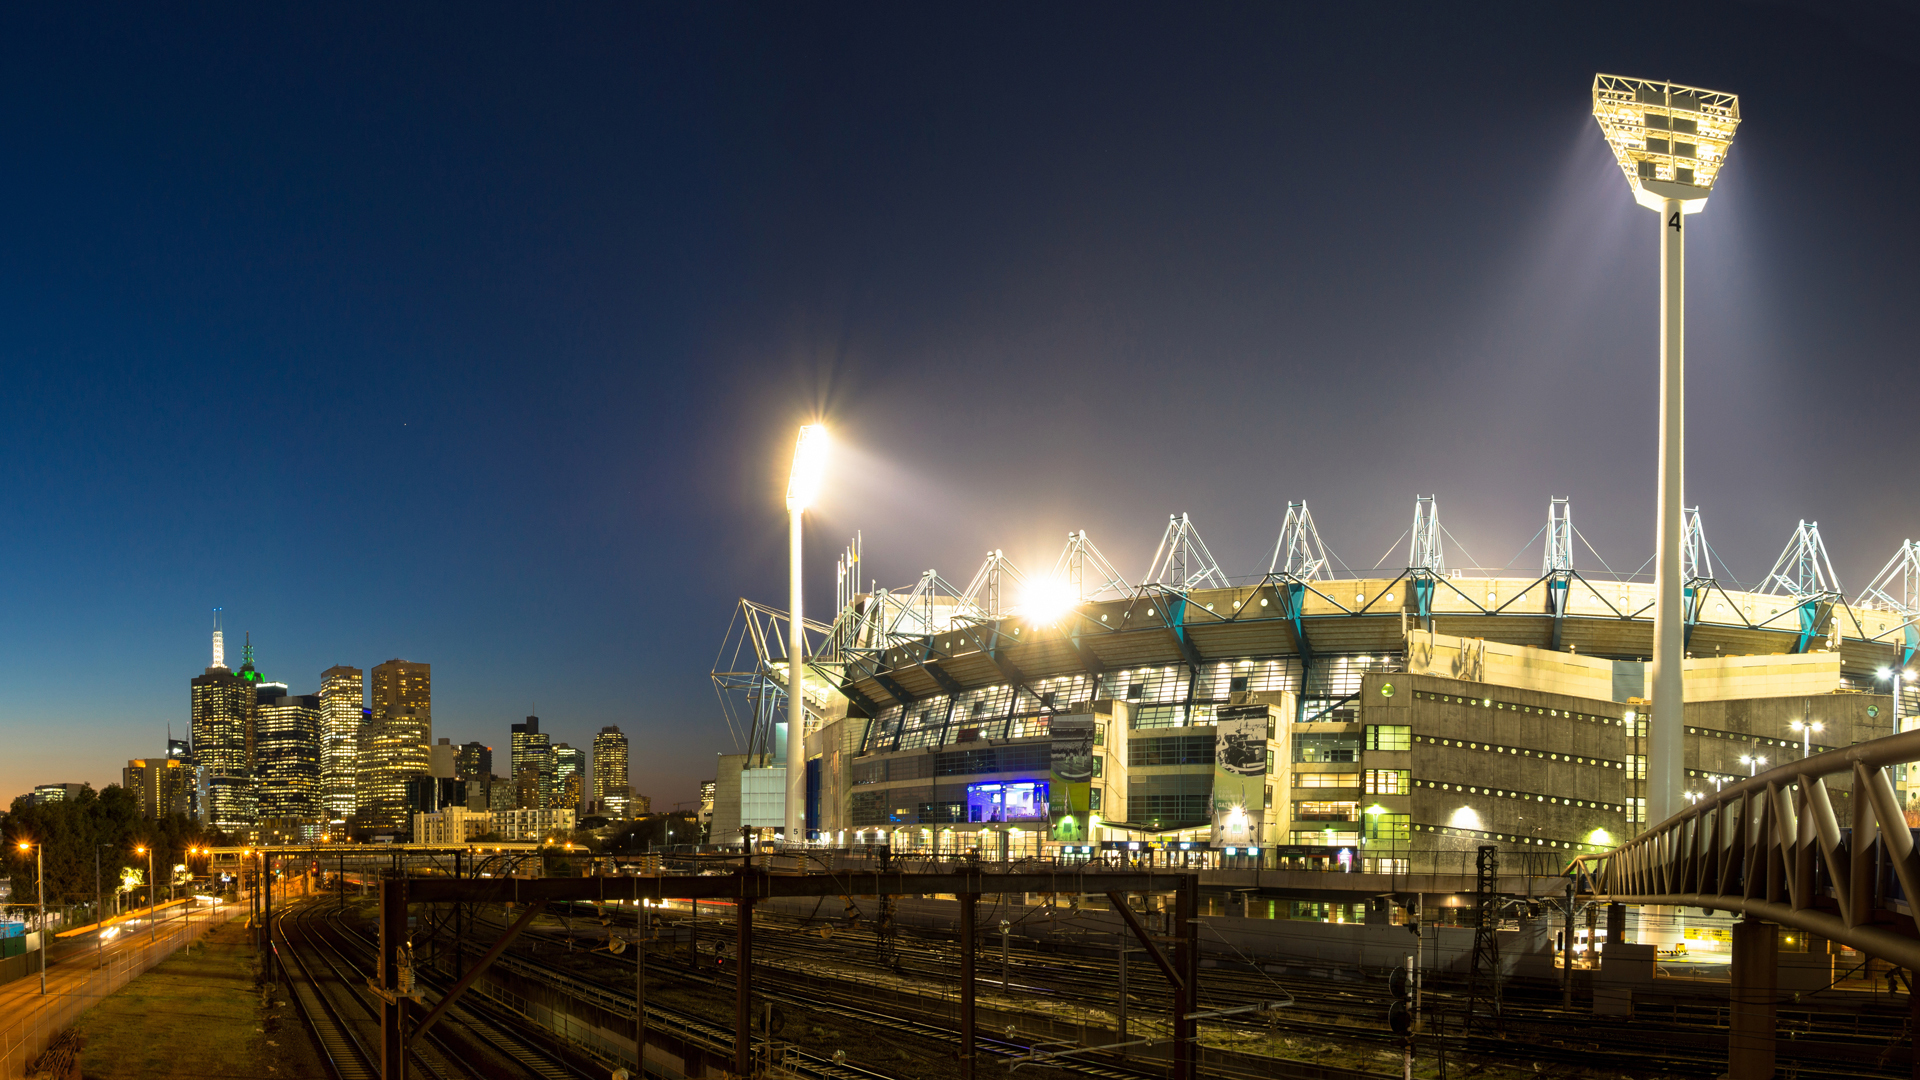 Melbourne Cricket Ground at night